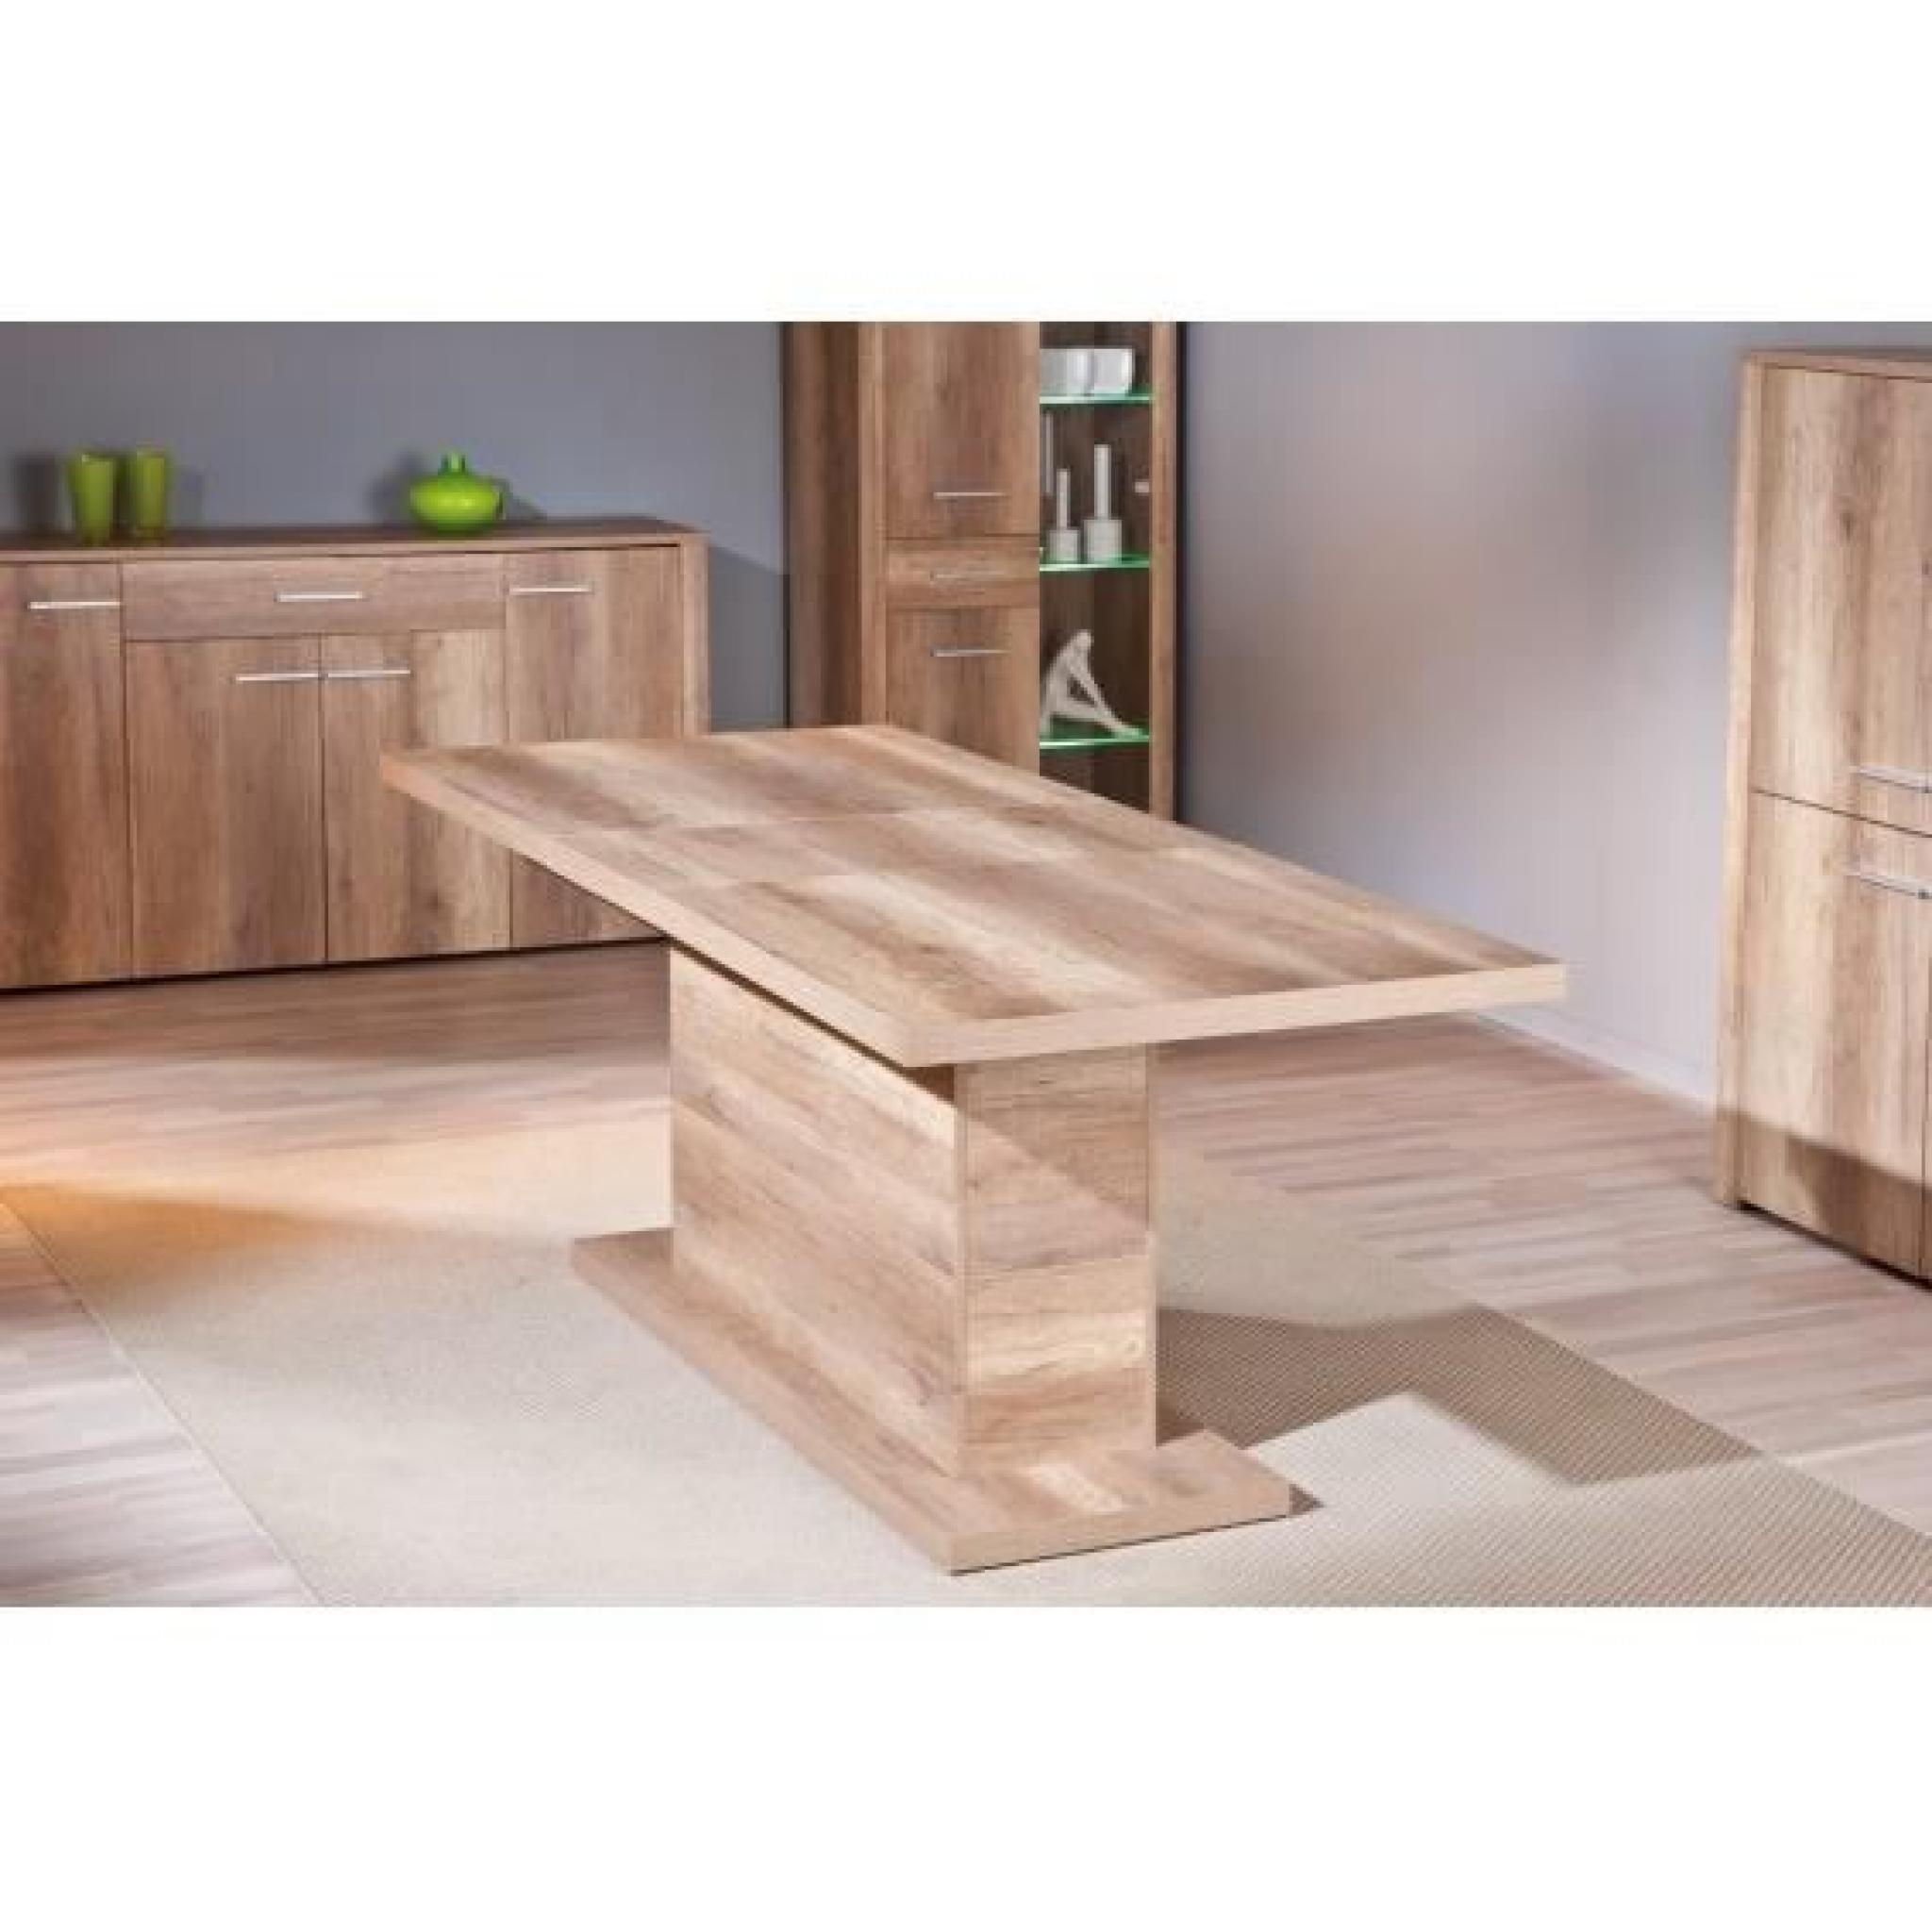 Myca ch ne table pied central avec allonge achat vente - Table salle a manger design pied central ...